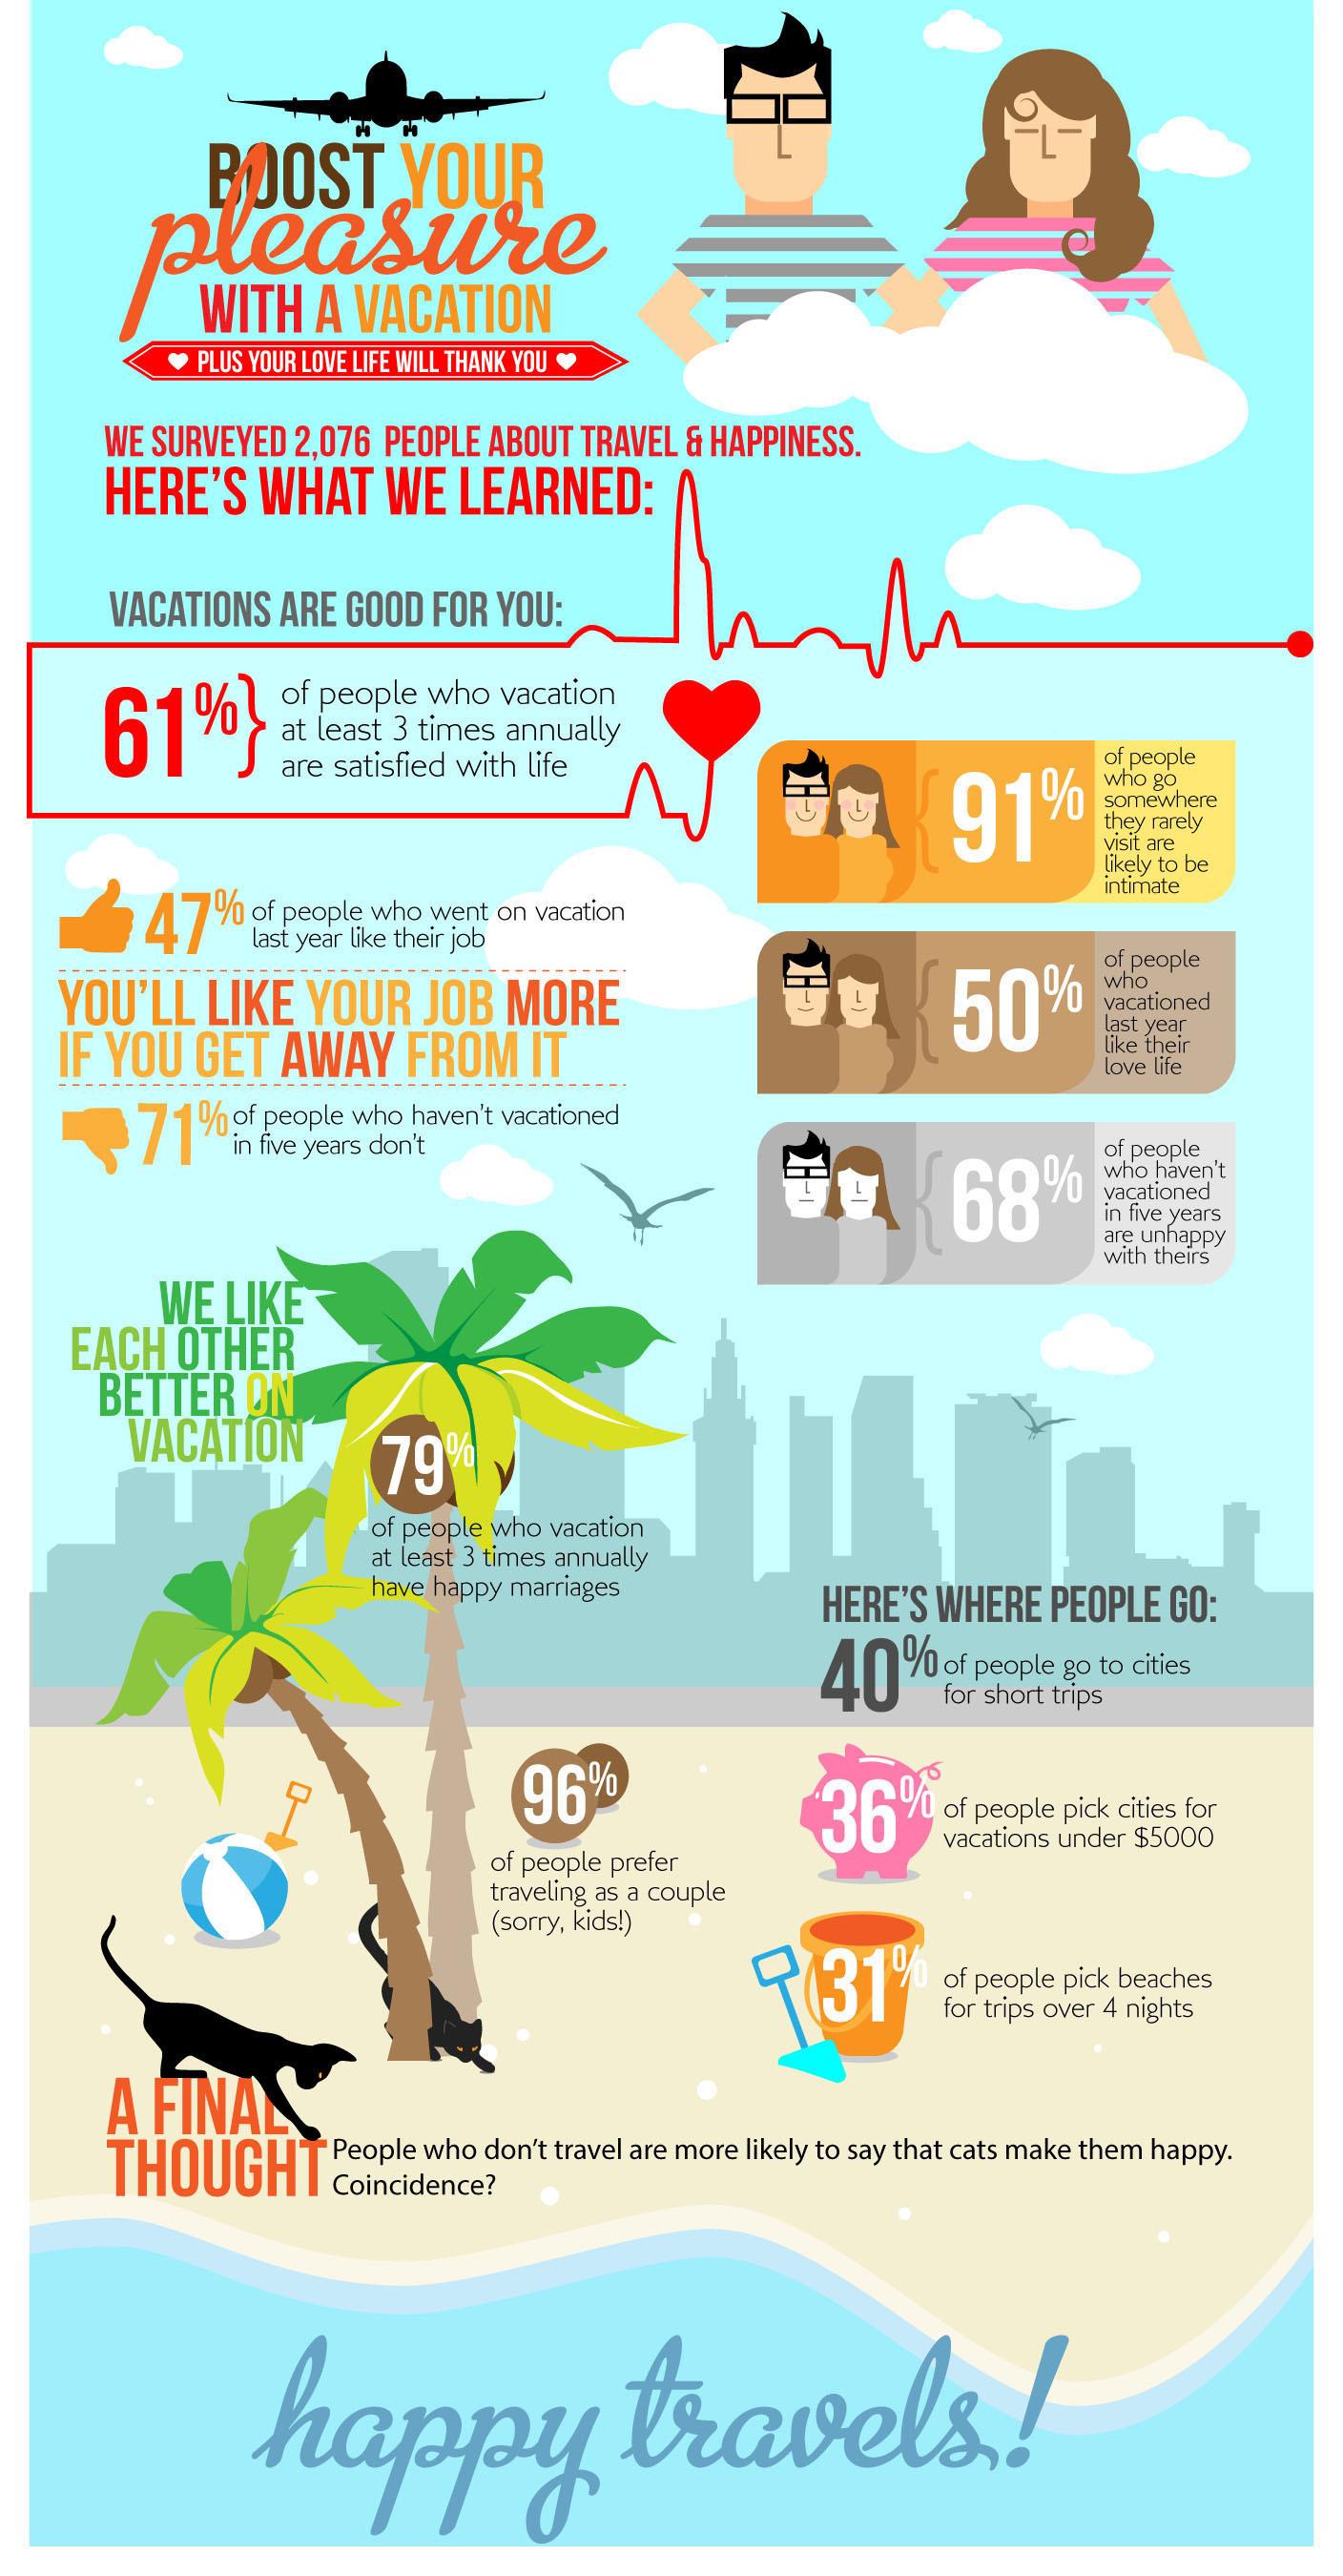 Vacations Boost Pleasure, Expedia Study Finds.  (PRNewsFoto/Expedia.com)